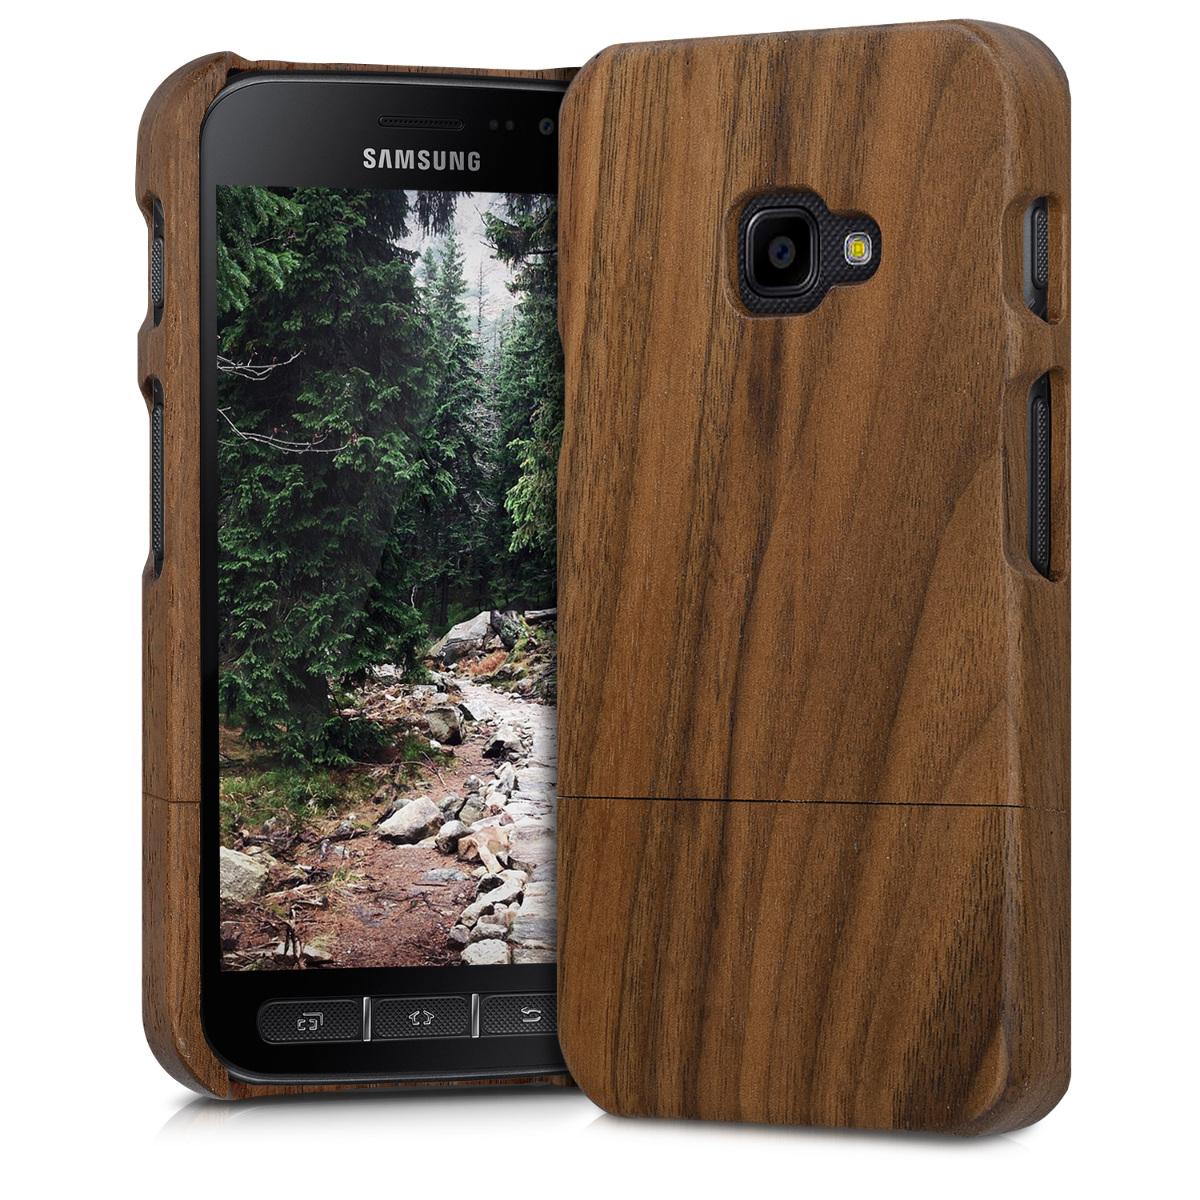 KW Ξύλινη Θήκη Samsung Galaxy Xcover 4 - Καφέ (41173.18)